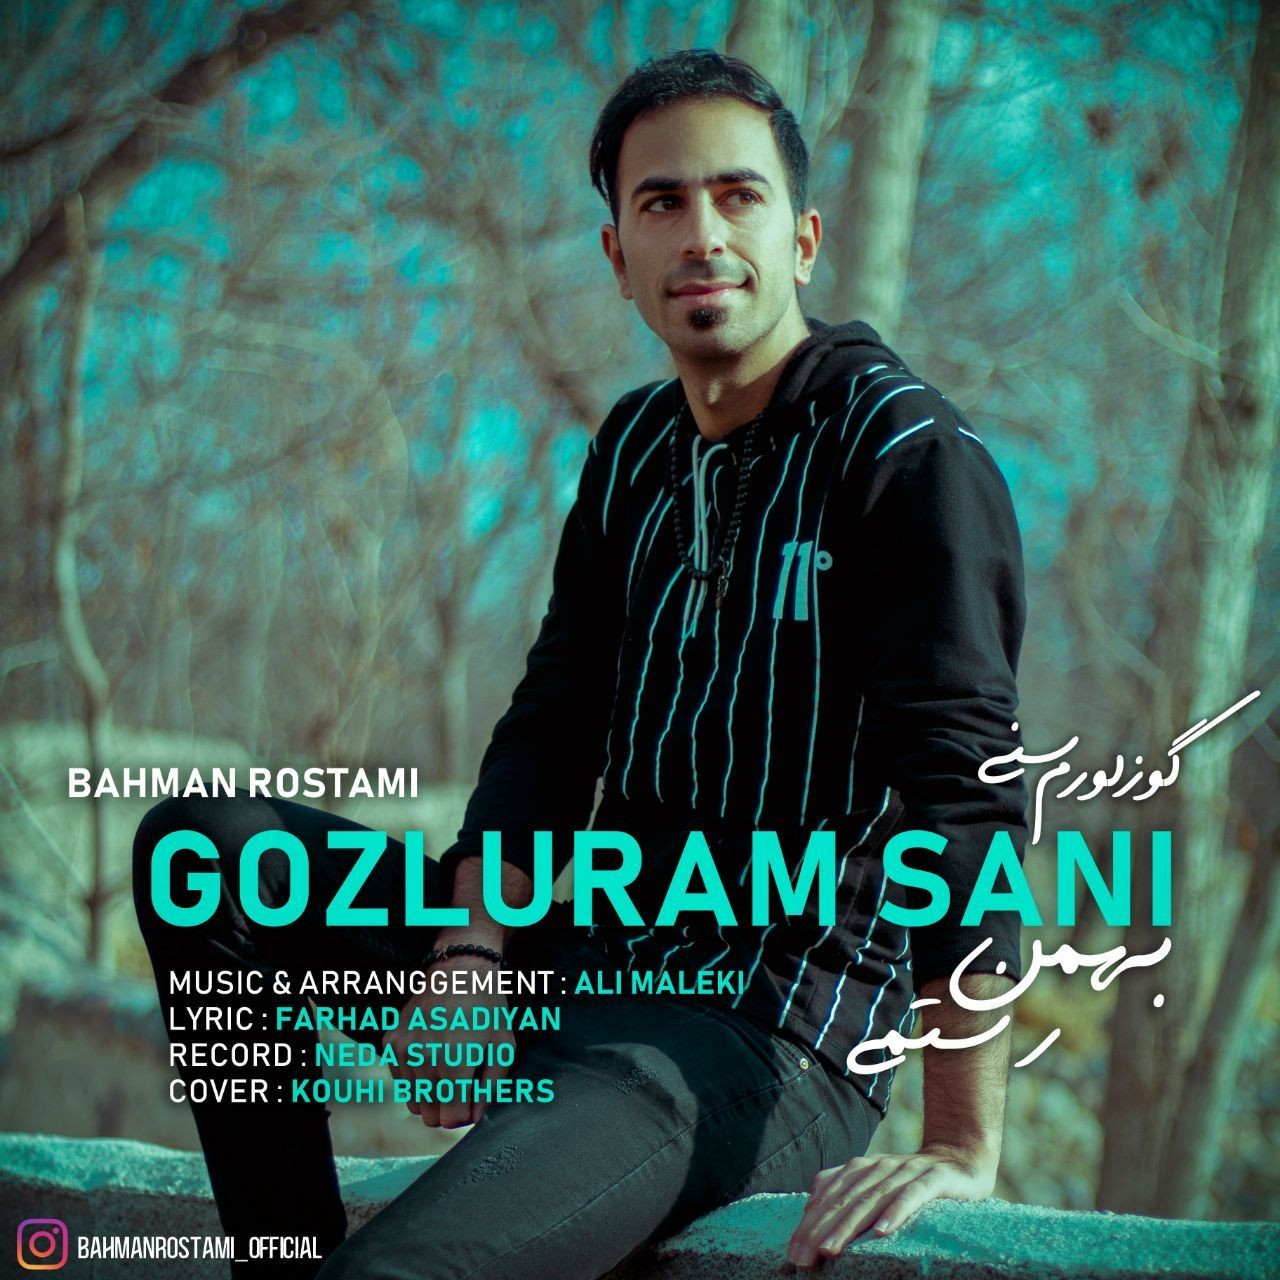 http://s7.picofile.com/file/8388890468/05Bahman_Rostami_Gozluram_Sani.jpg